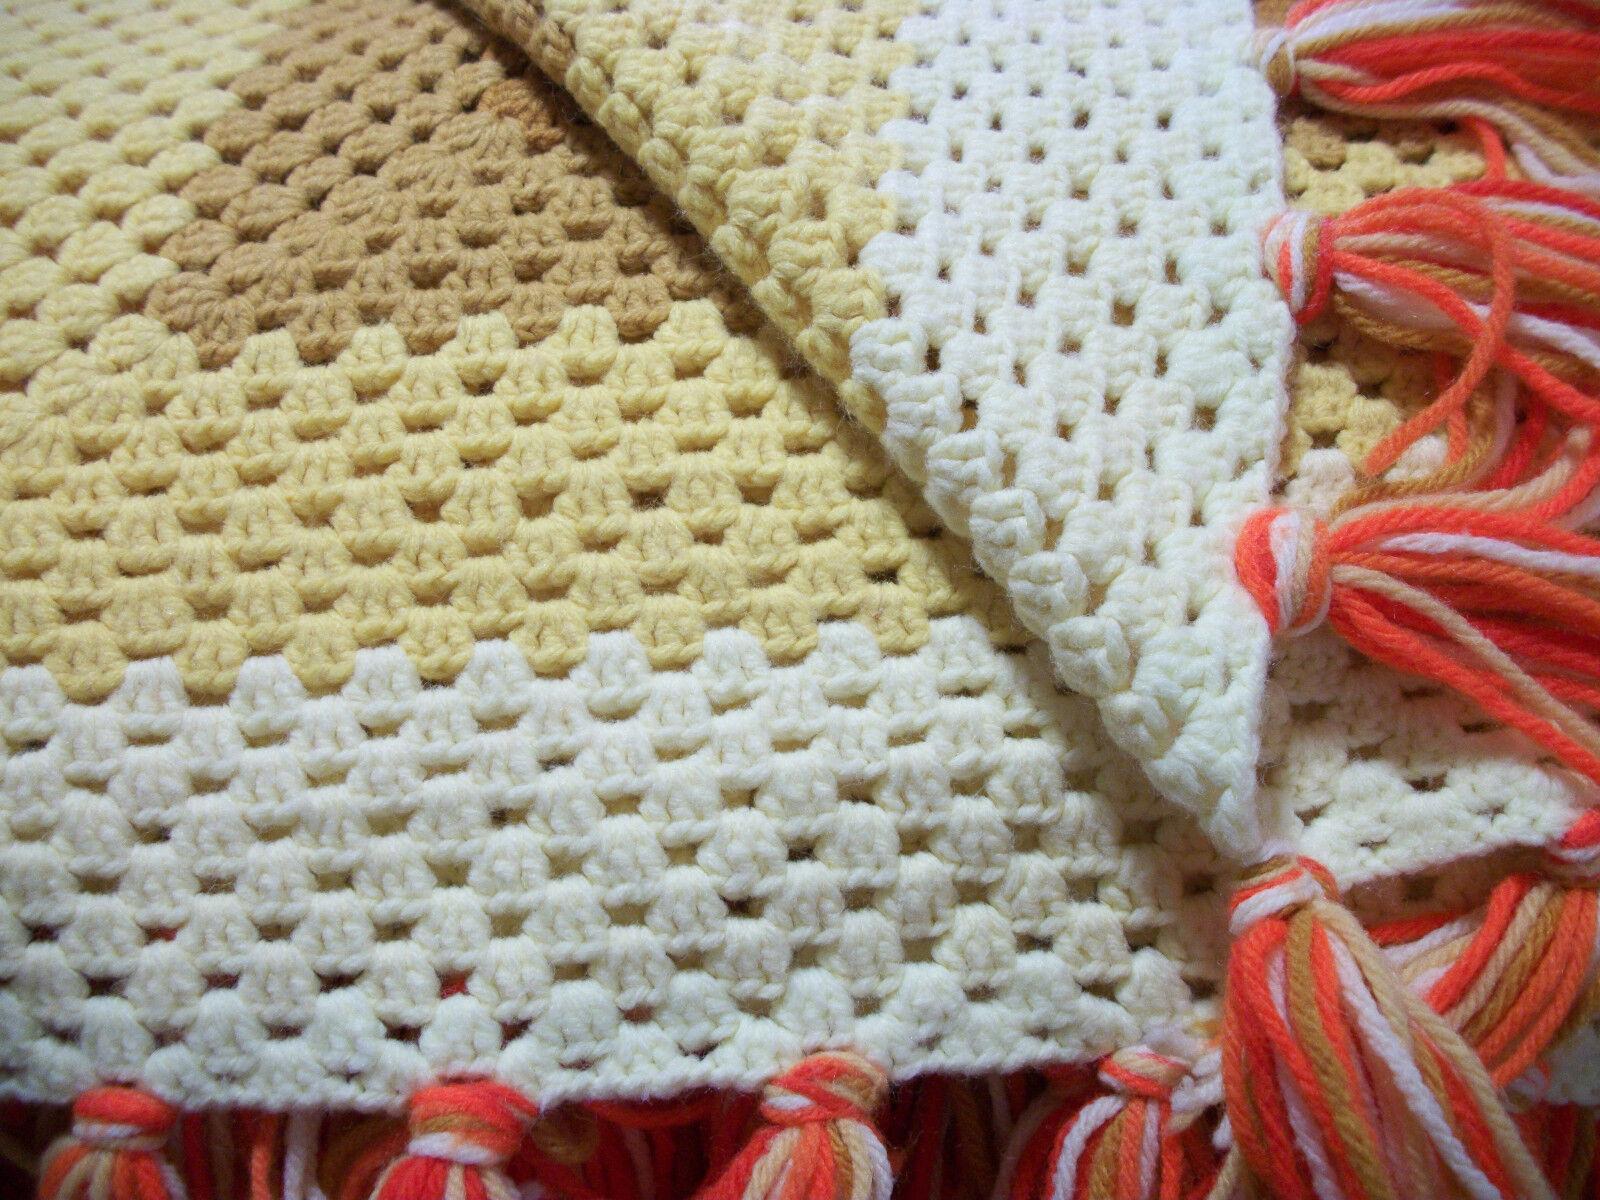 Crochet Knitted Blanket Queen King 102 X102  gold Tan Yellow White orange